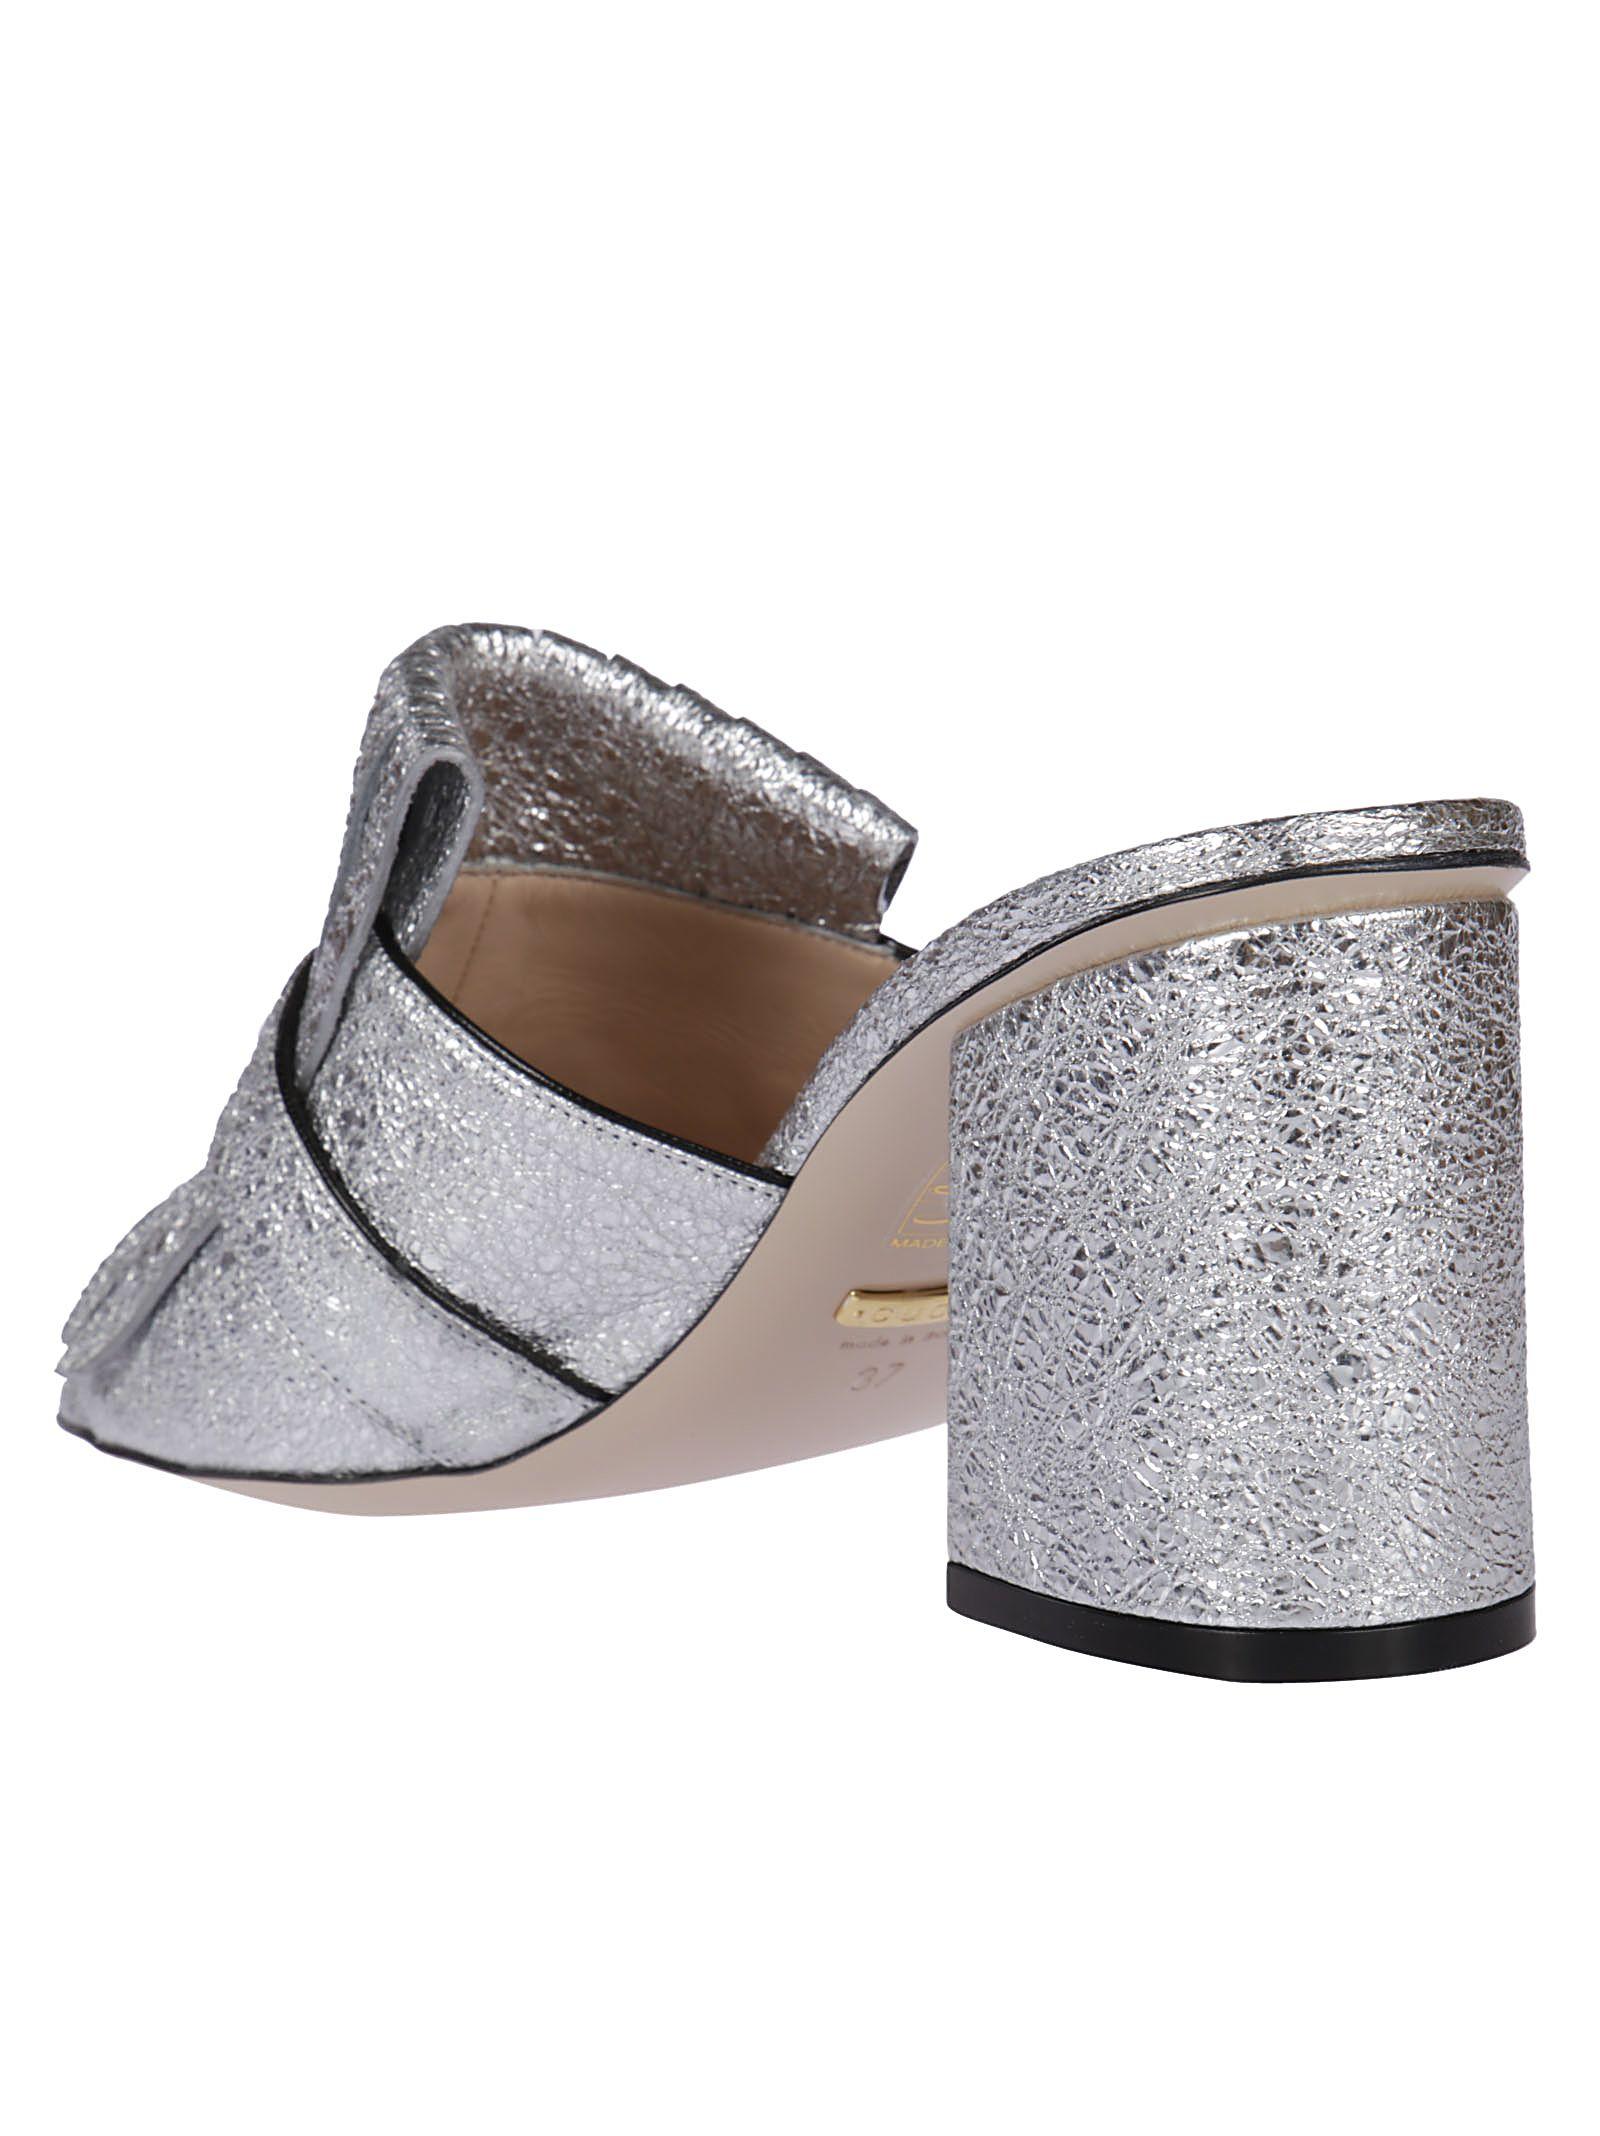 c4d2bf4a528a Gucci Gucci Fringe Flap Mules - Silver - 5907315